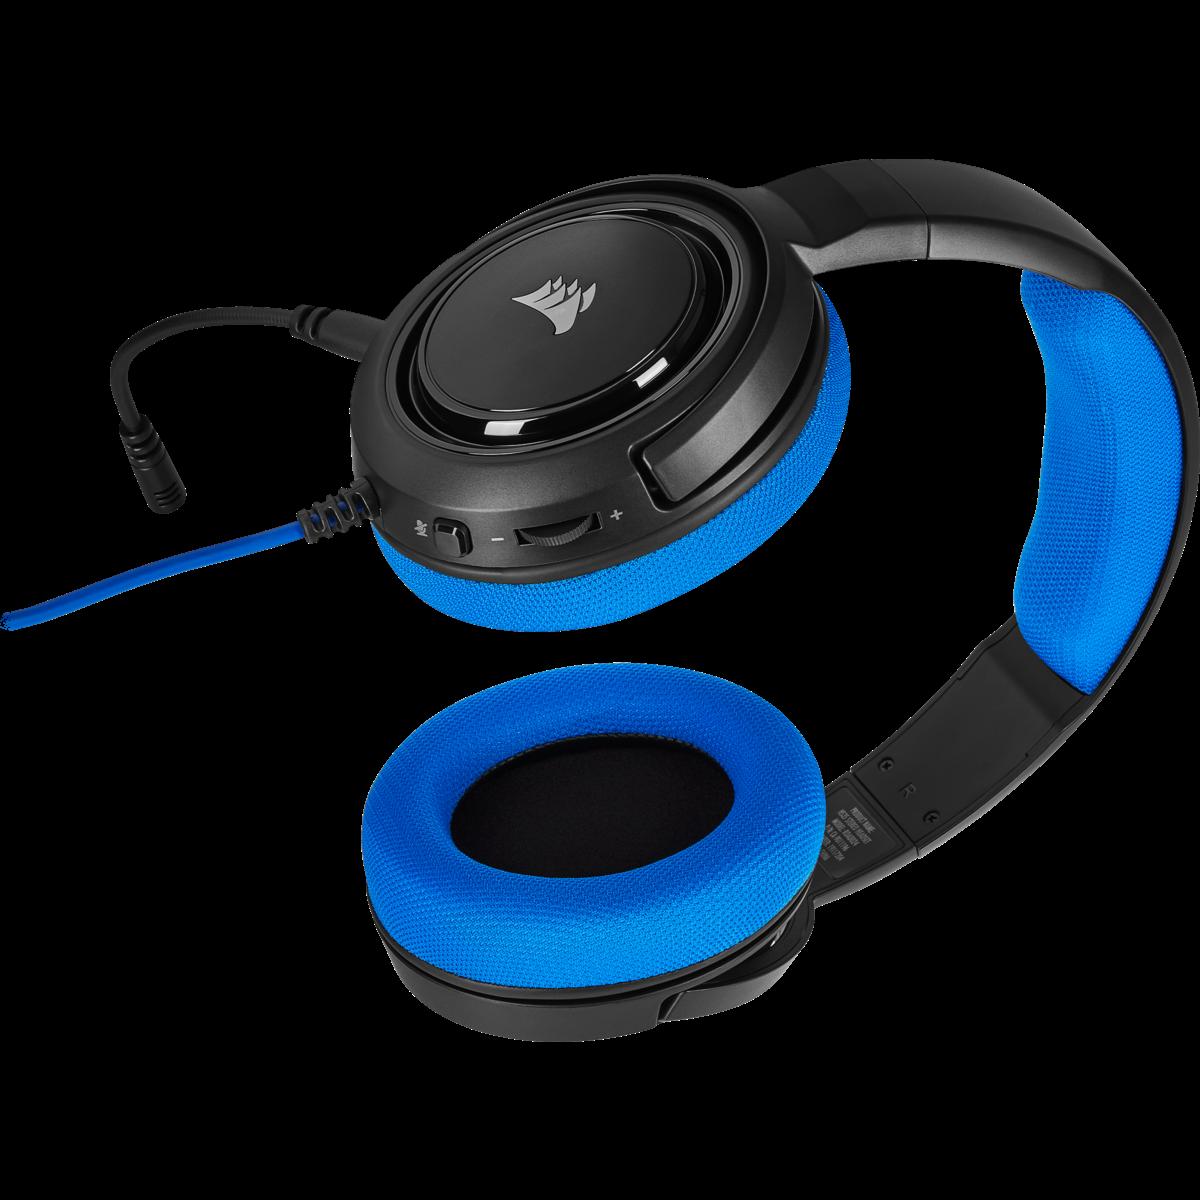 Headset Gamer Corsair HS35 Stereo Blue, CA-9011196-NA